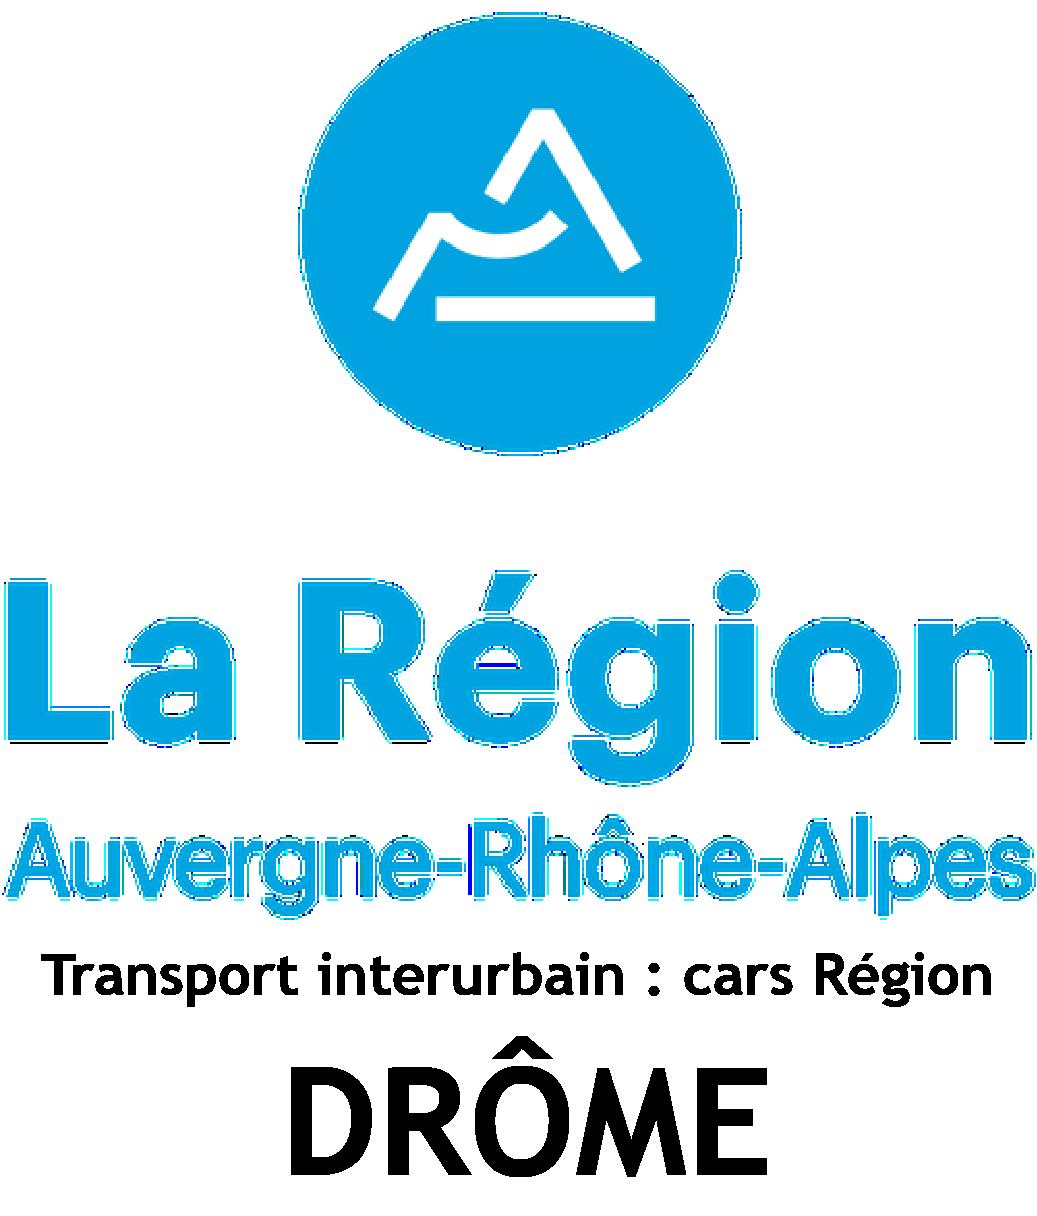 Région Auvergne Rhône Alpes : Drôme